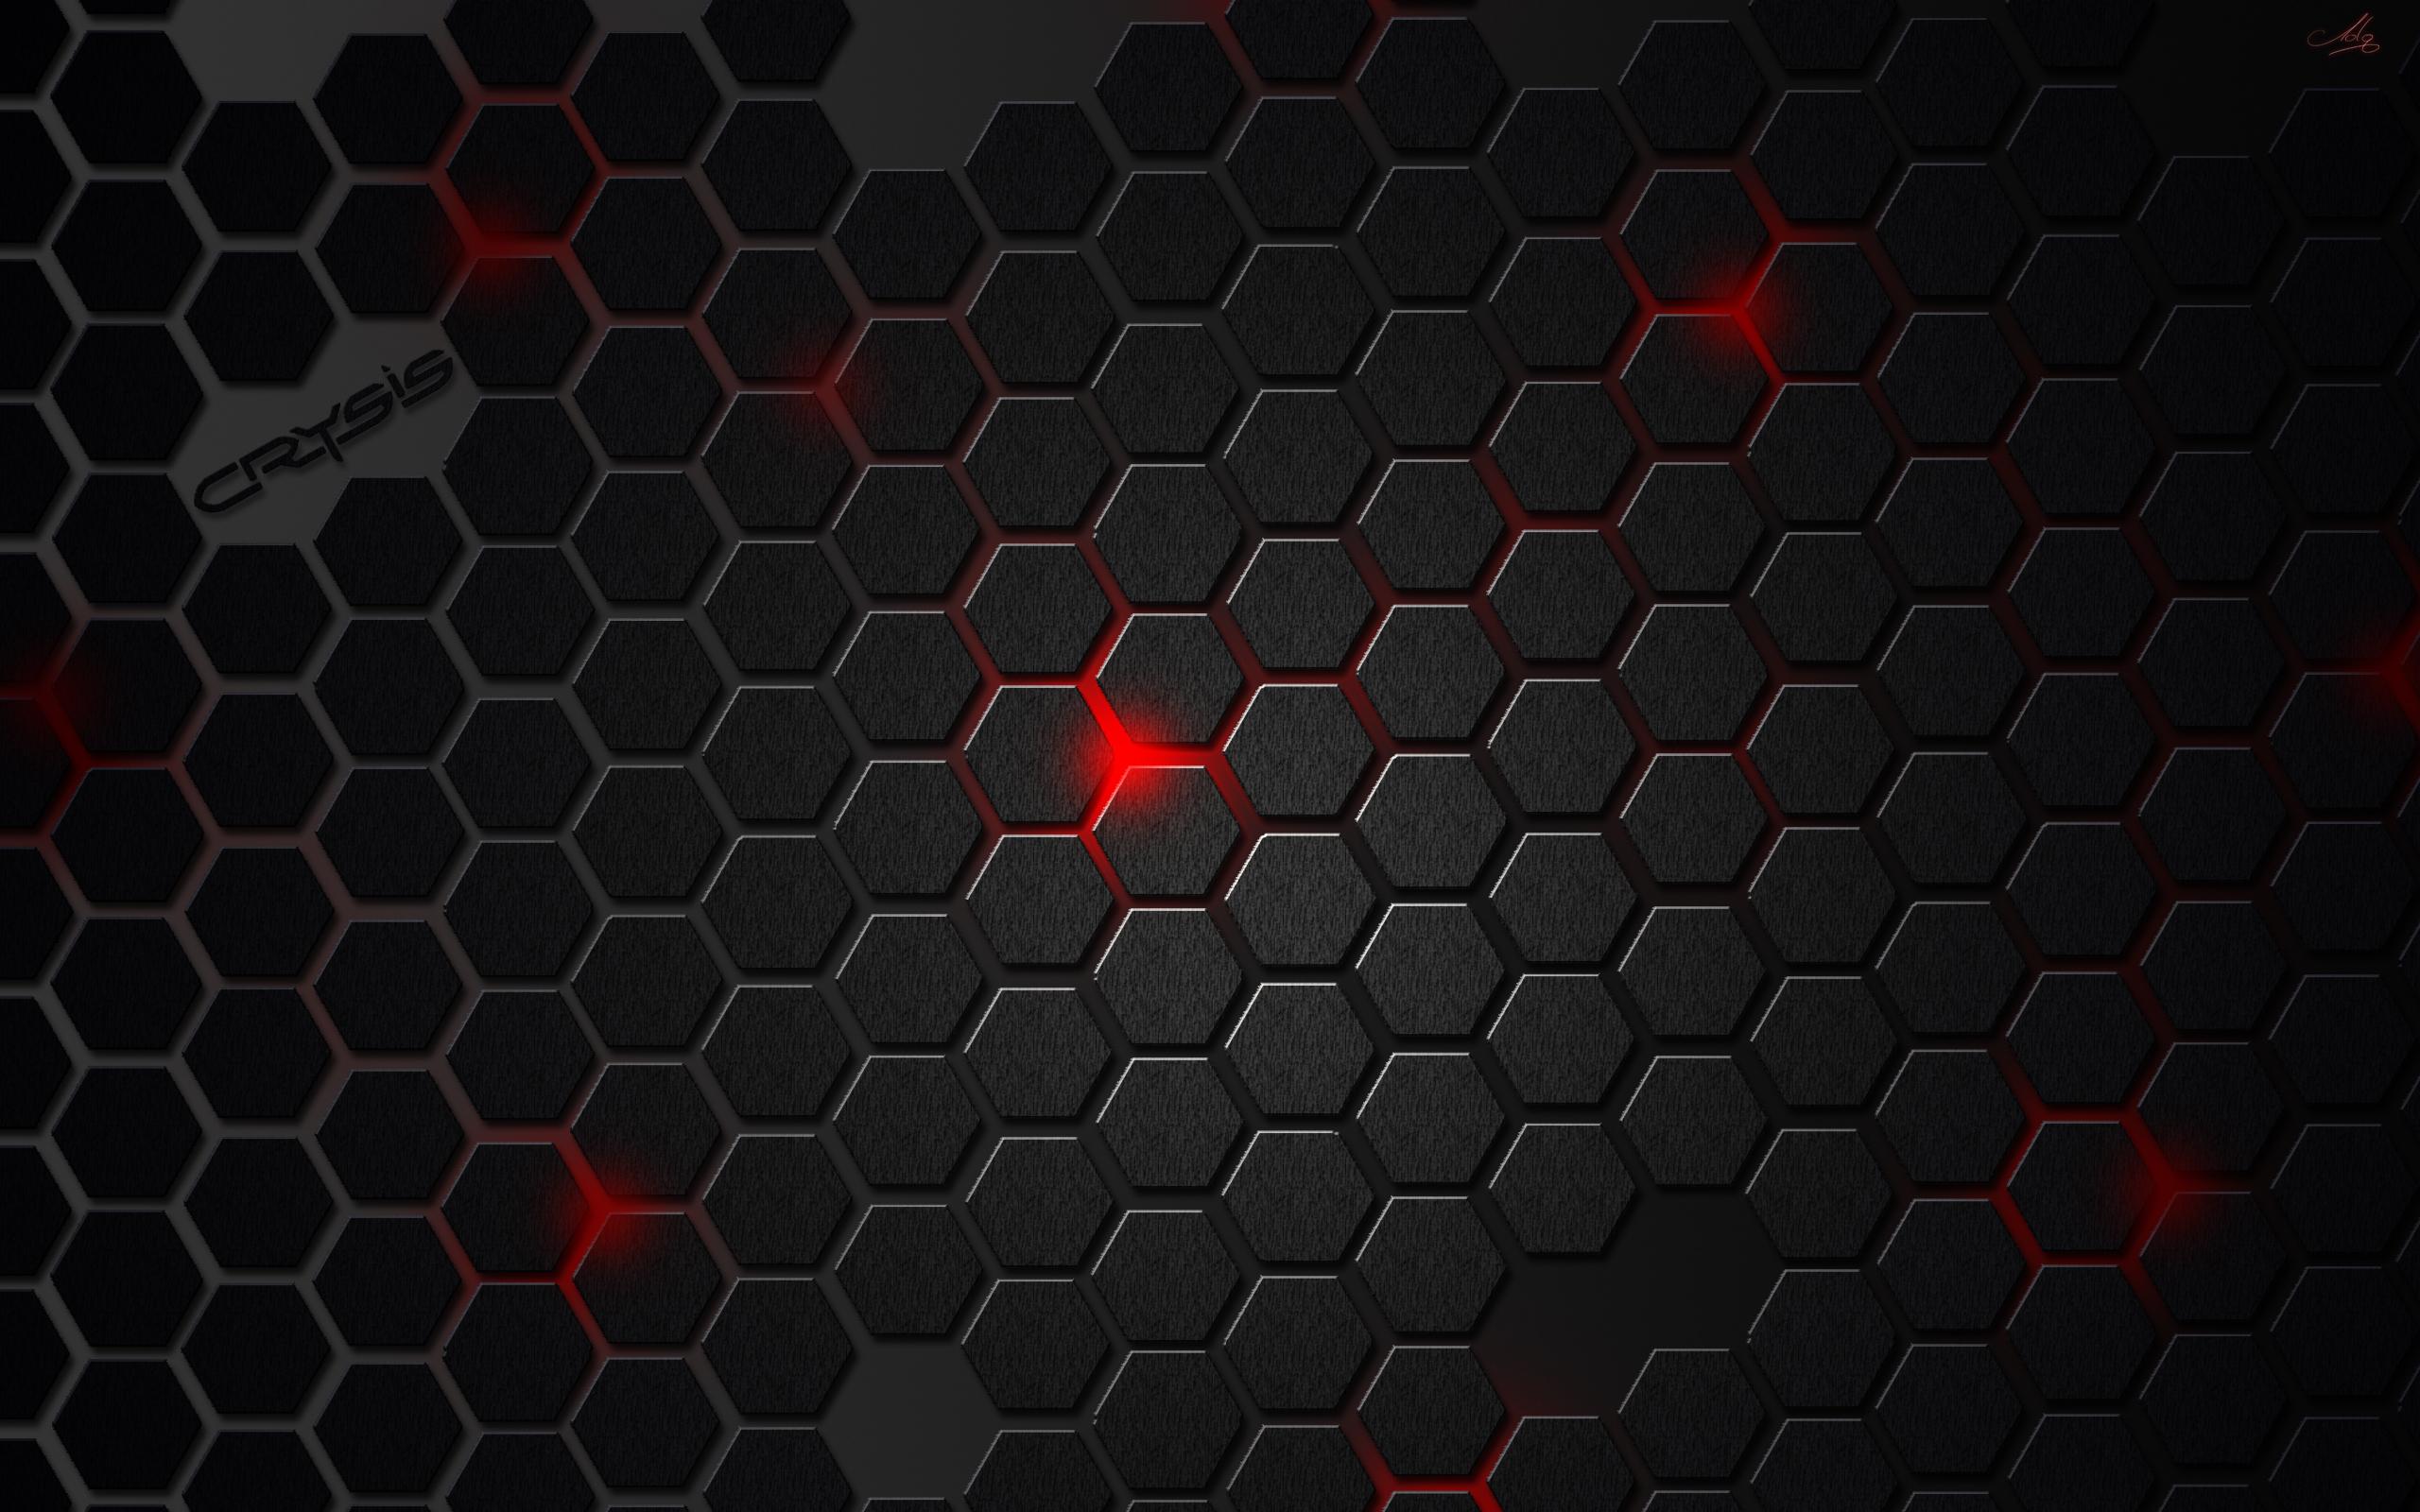 Red With Black Texture Wallpaper Wallpaper WallpaperLepi 2560x1600